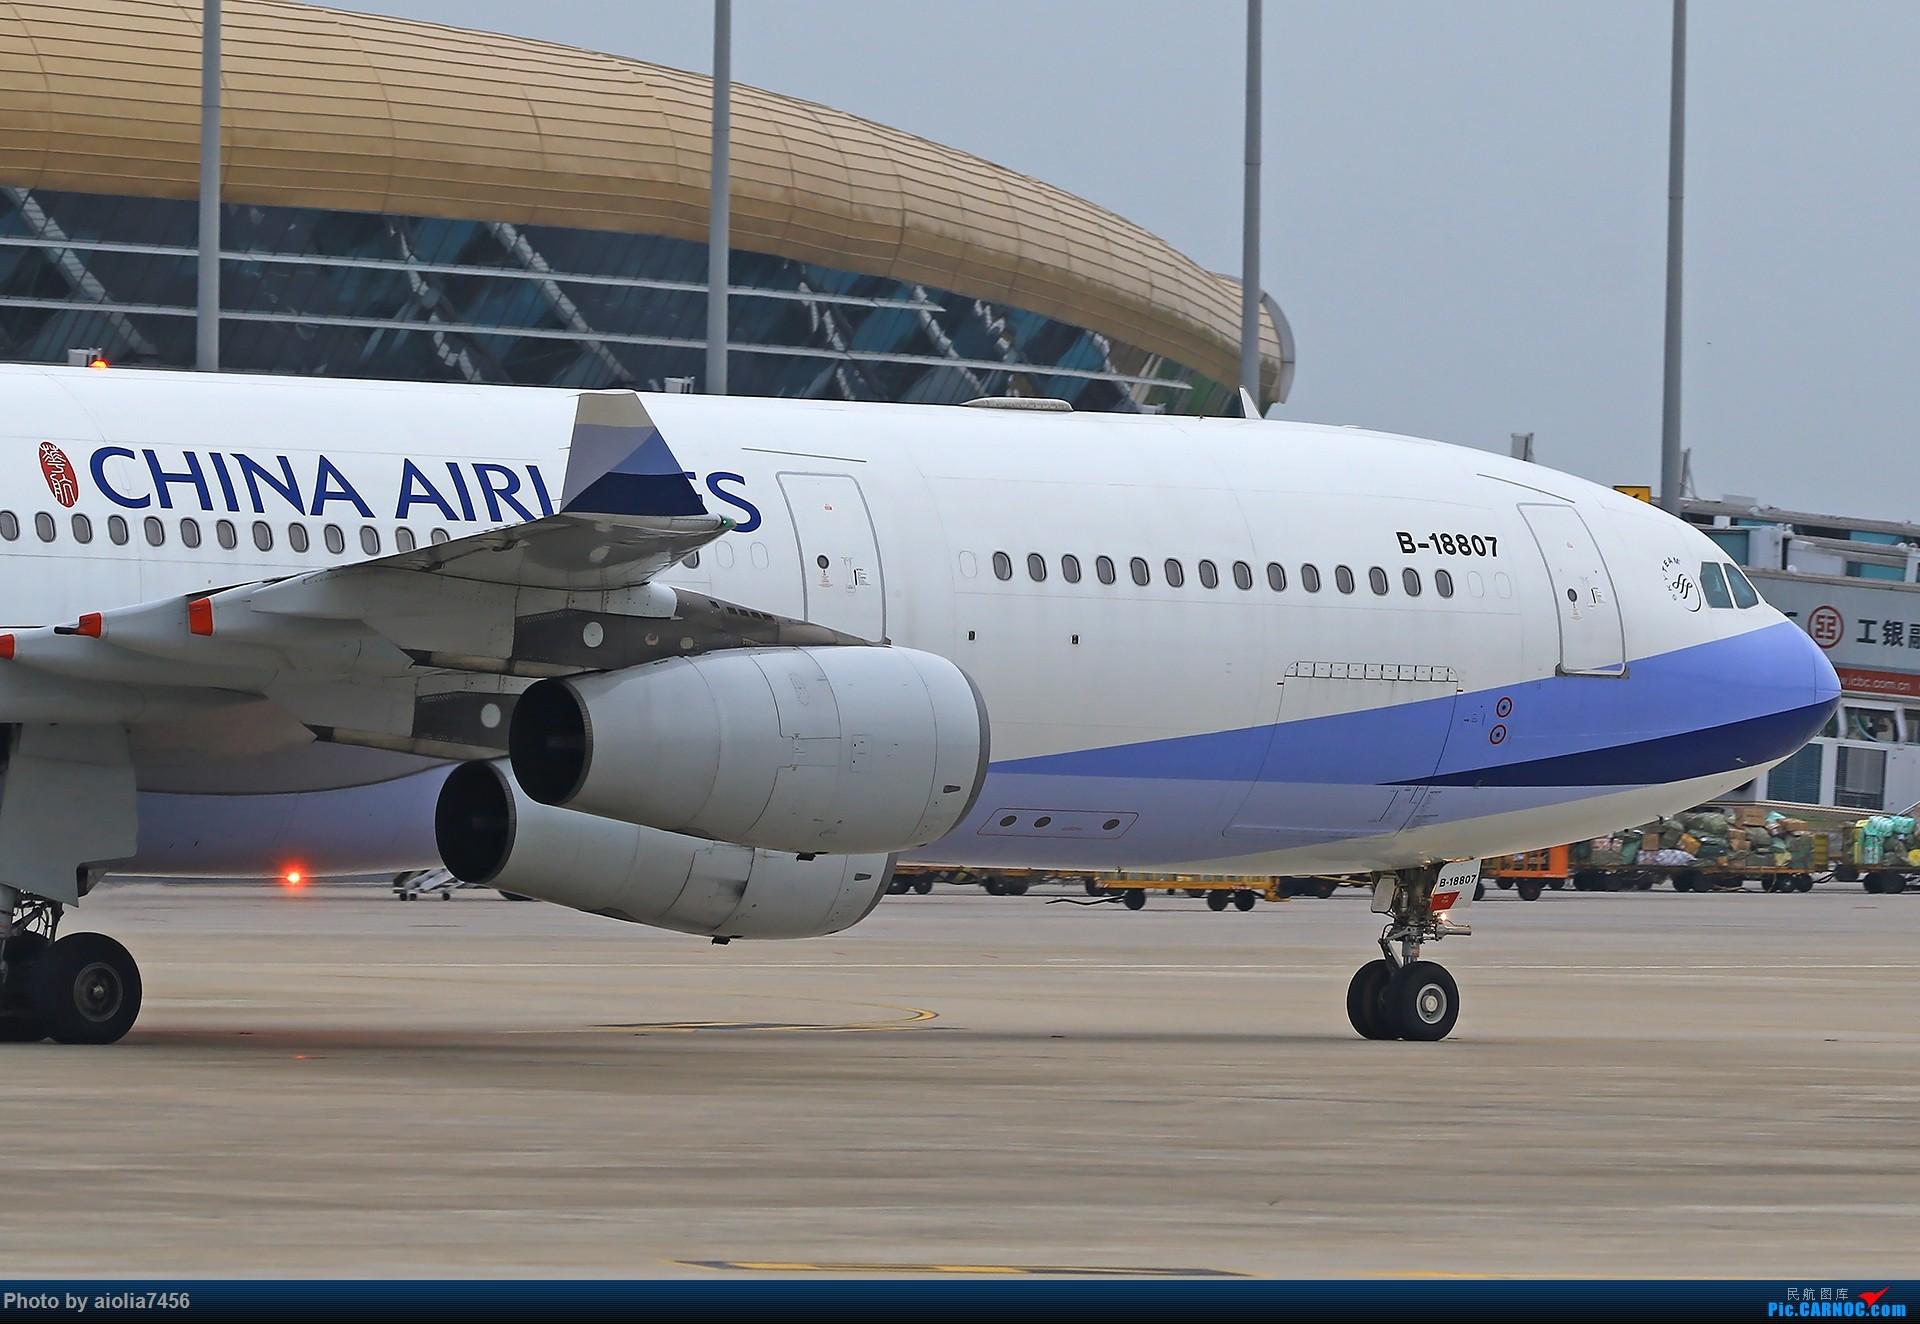 Re:[原创][合肥飞友会]霸都打鸡 找个机会白天打华航 顺便看看期待已久的迪斯尼 AIRBUS A340-300 B-18807 中国合肥新桥国际机场